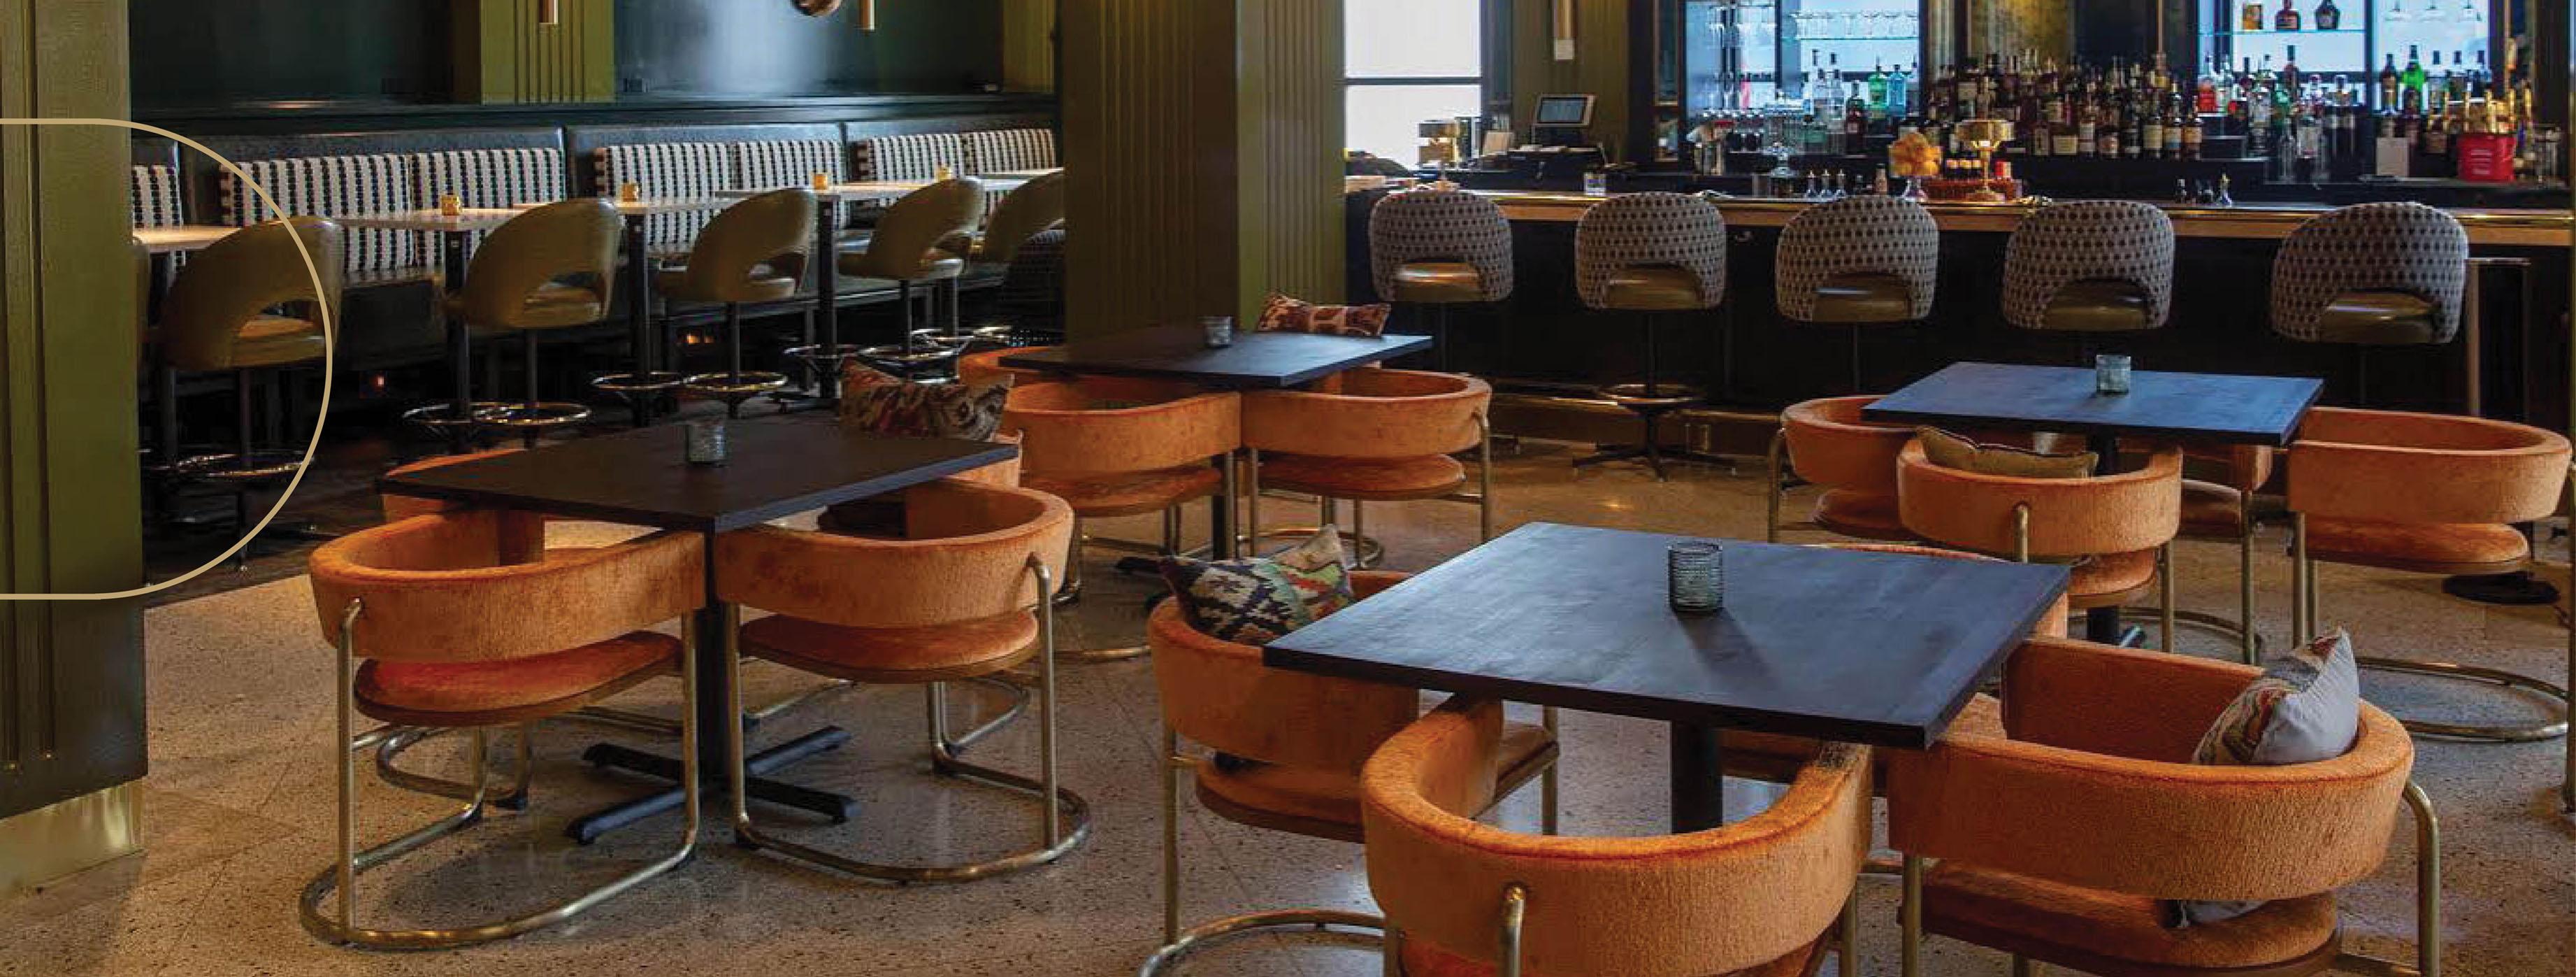 FR-One fabrics at The Treasury cocktail bar